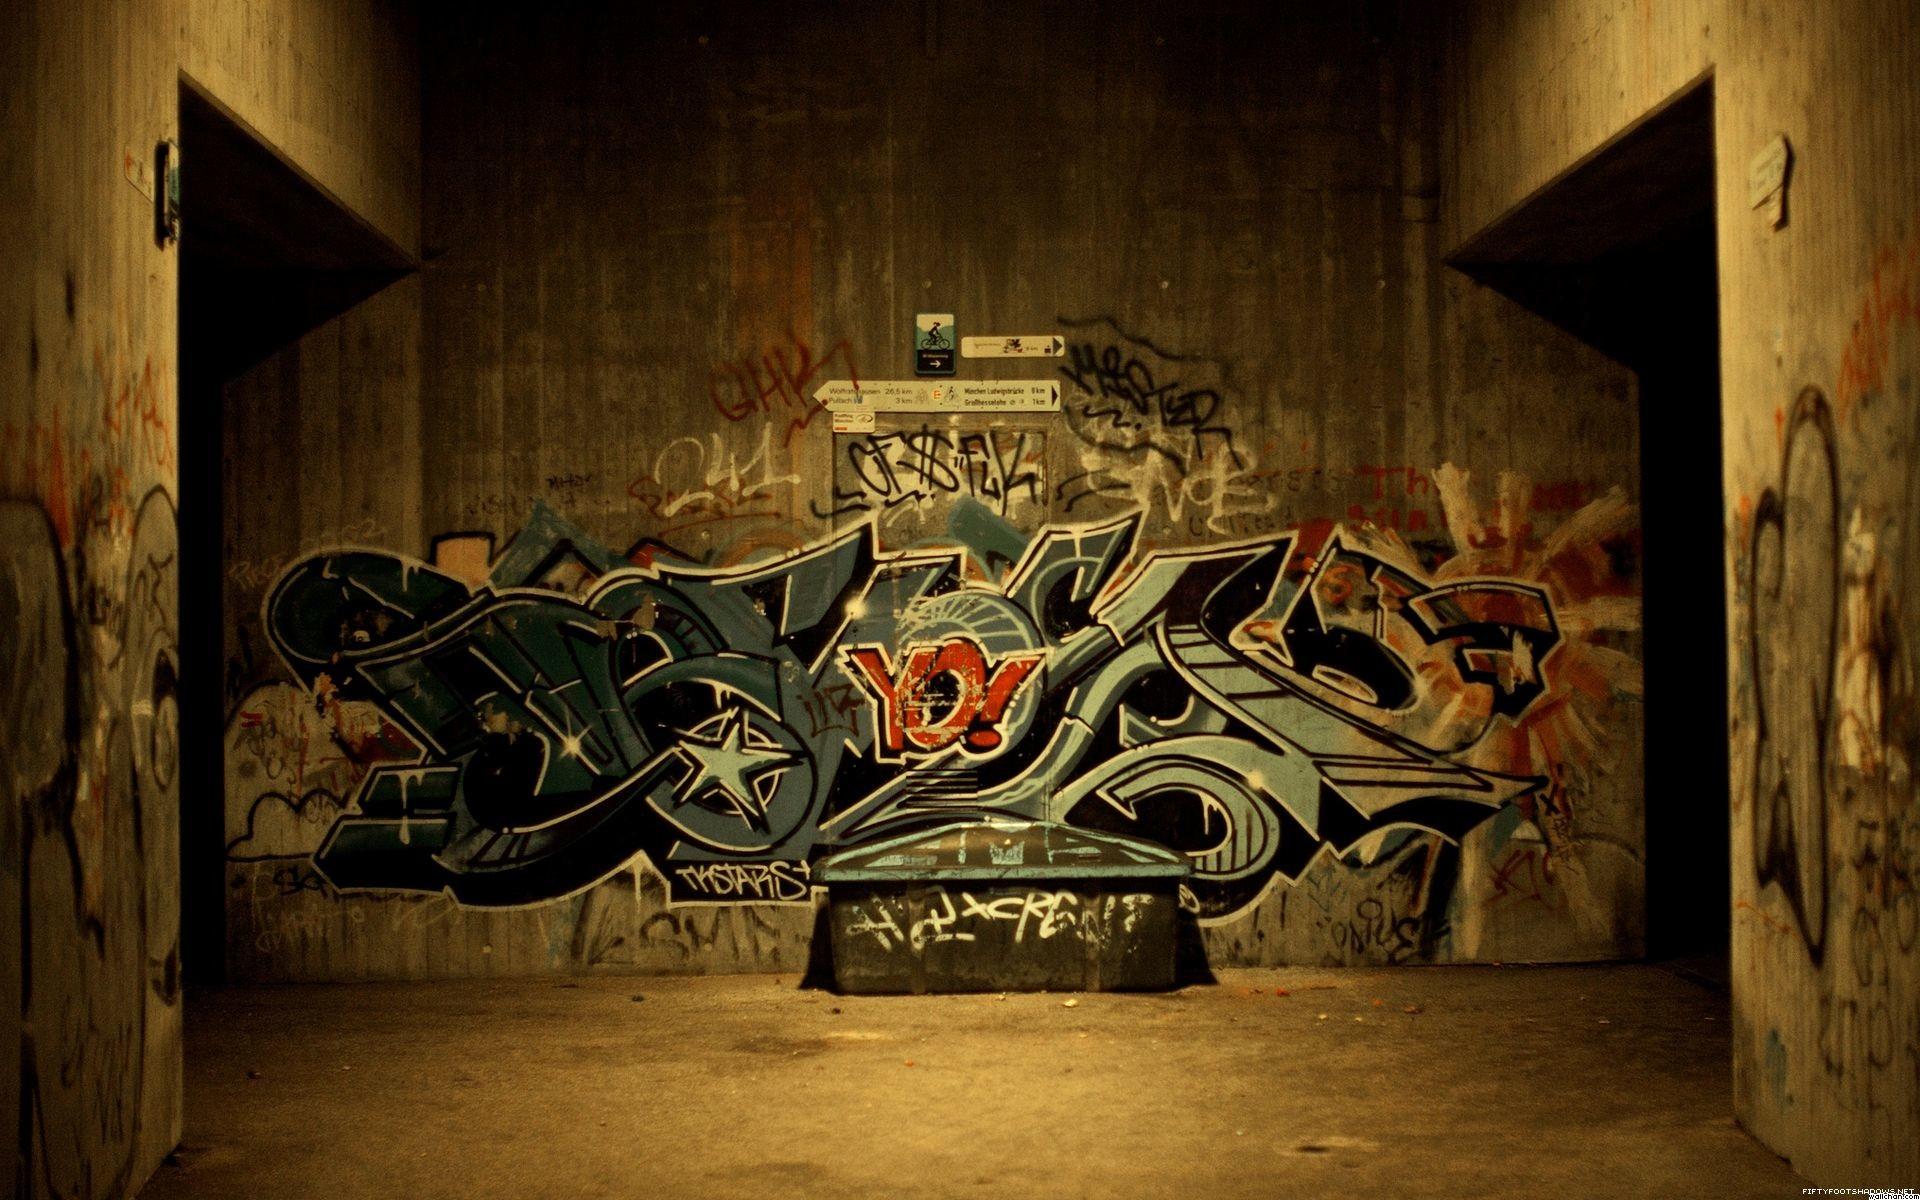 Hip hop graffiti wallpaper 55 images 1920x1200 hip hop graffiti free unique wallpaper 1920x1200 full hd wallpapers voltagebd Image collections